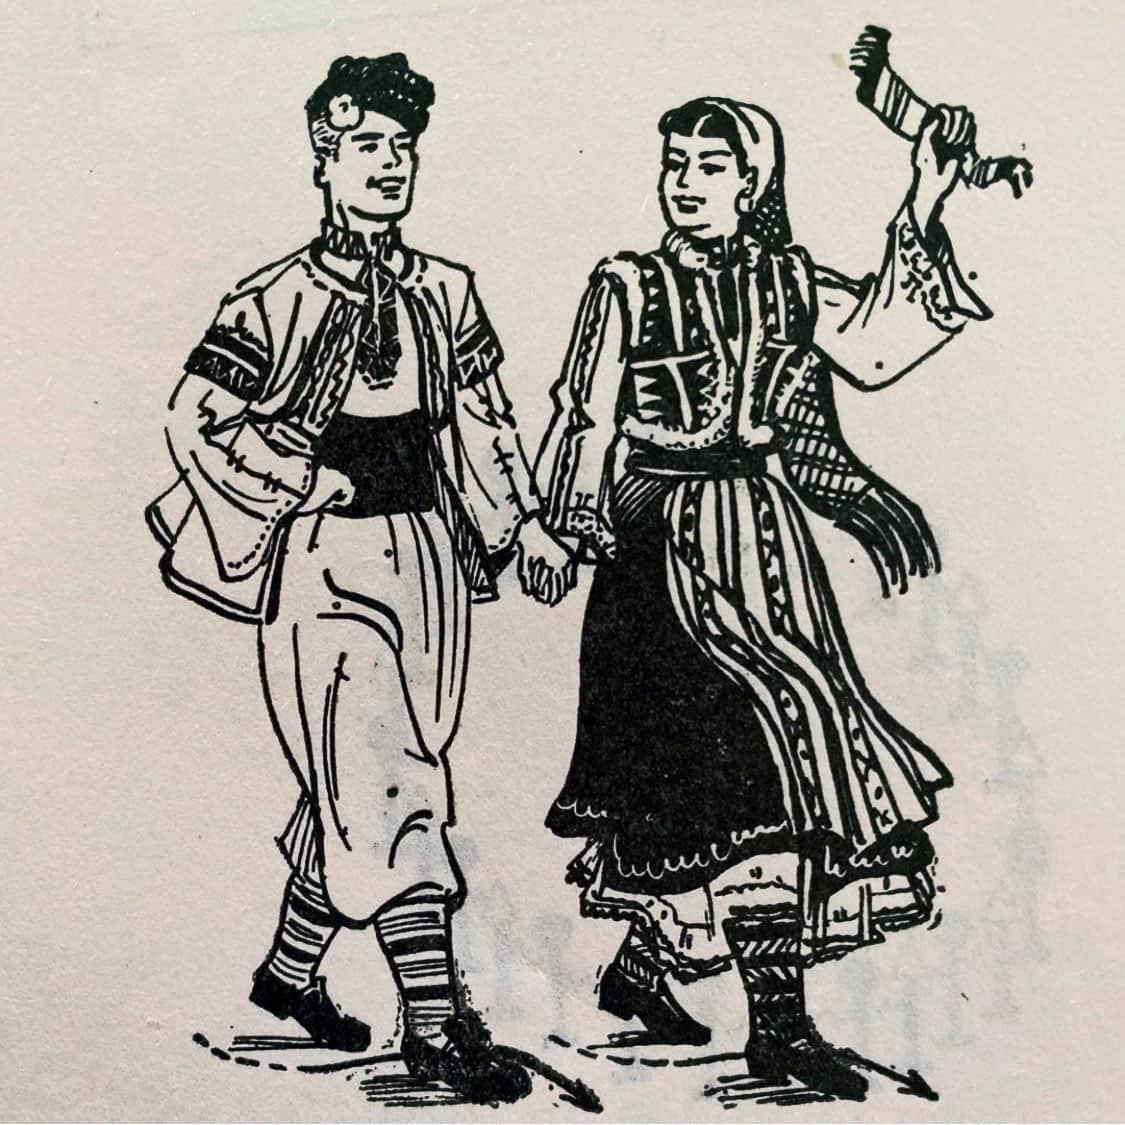 илюстрация Дайчово хоро кръстосани пайдушки